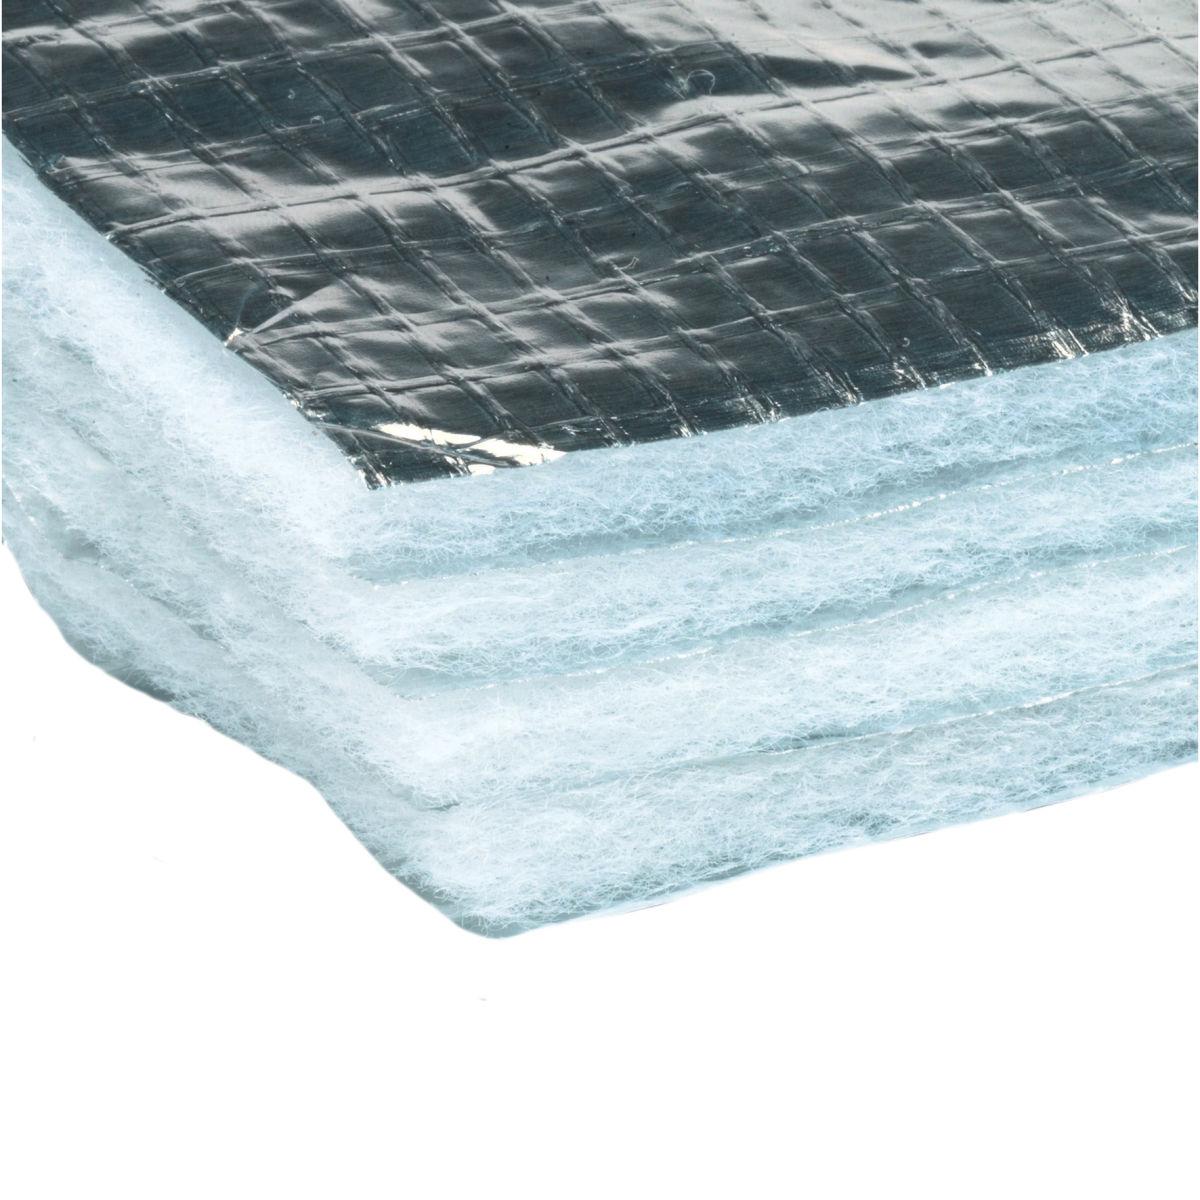 Pannelli isolanti leroy merlin glitter pareti tiarch com for Pannelli polistirolo per soffitti leroy merlin